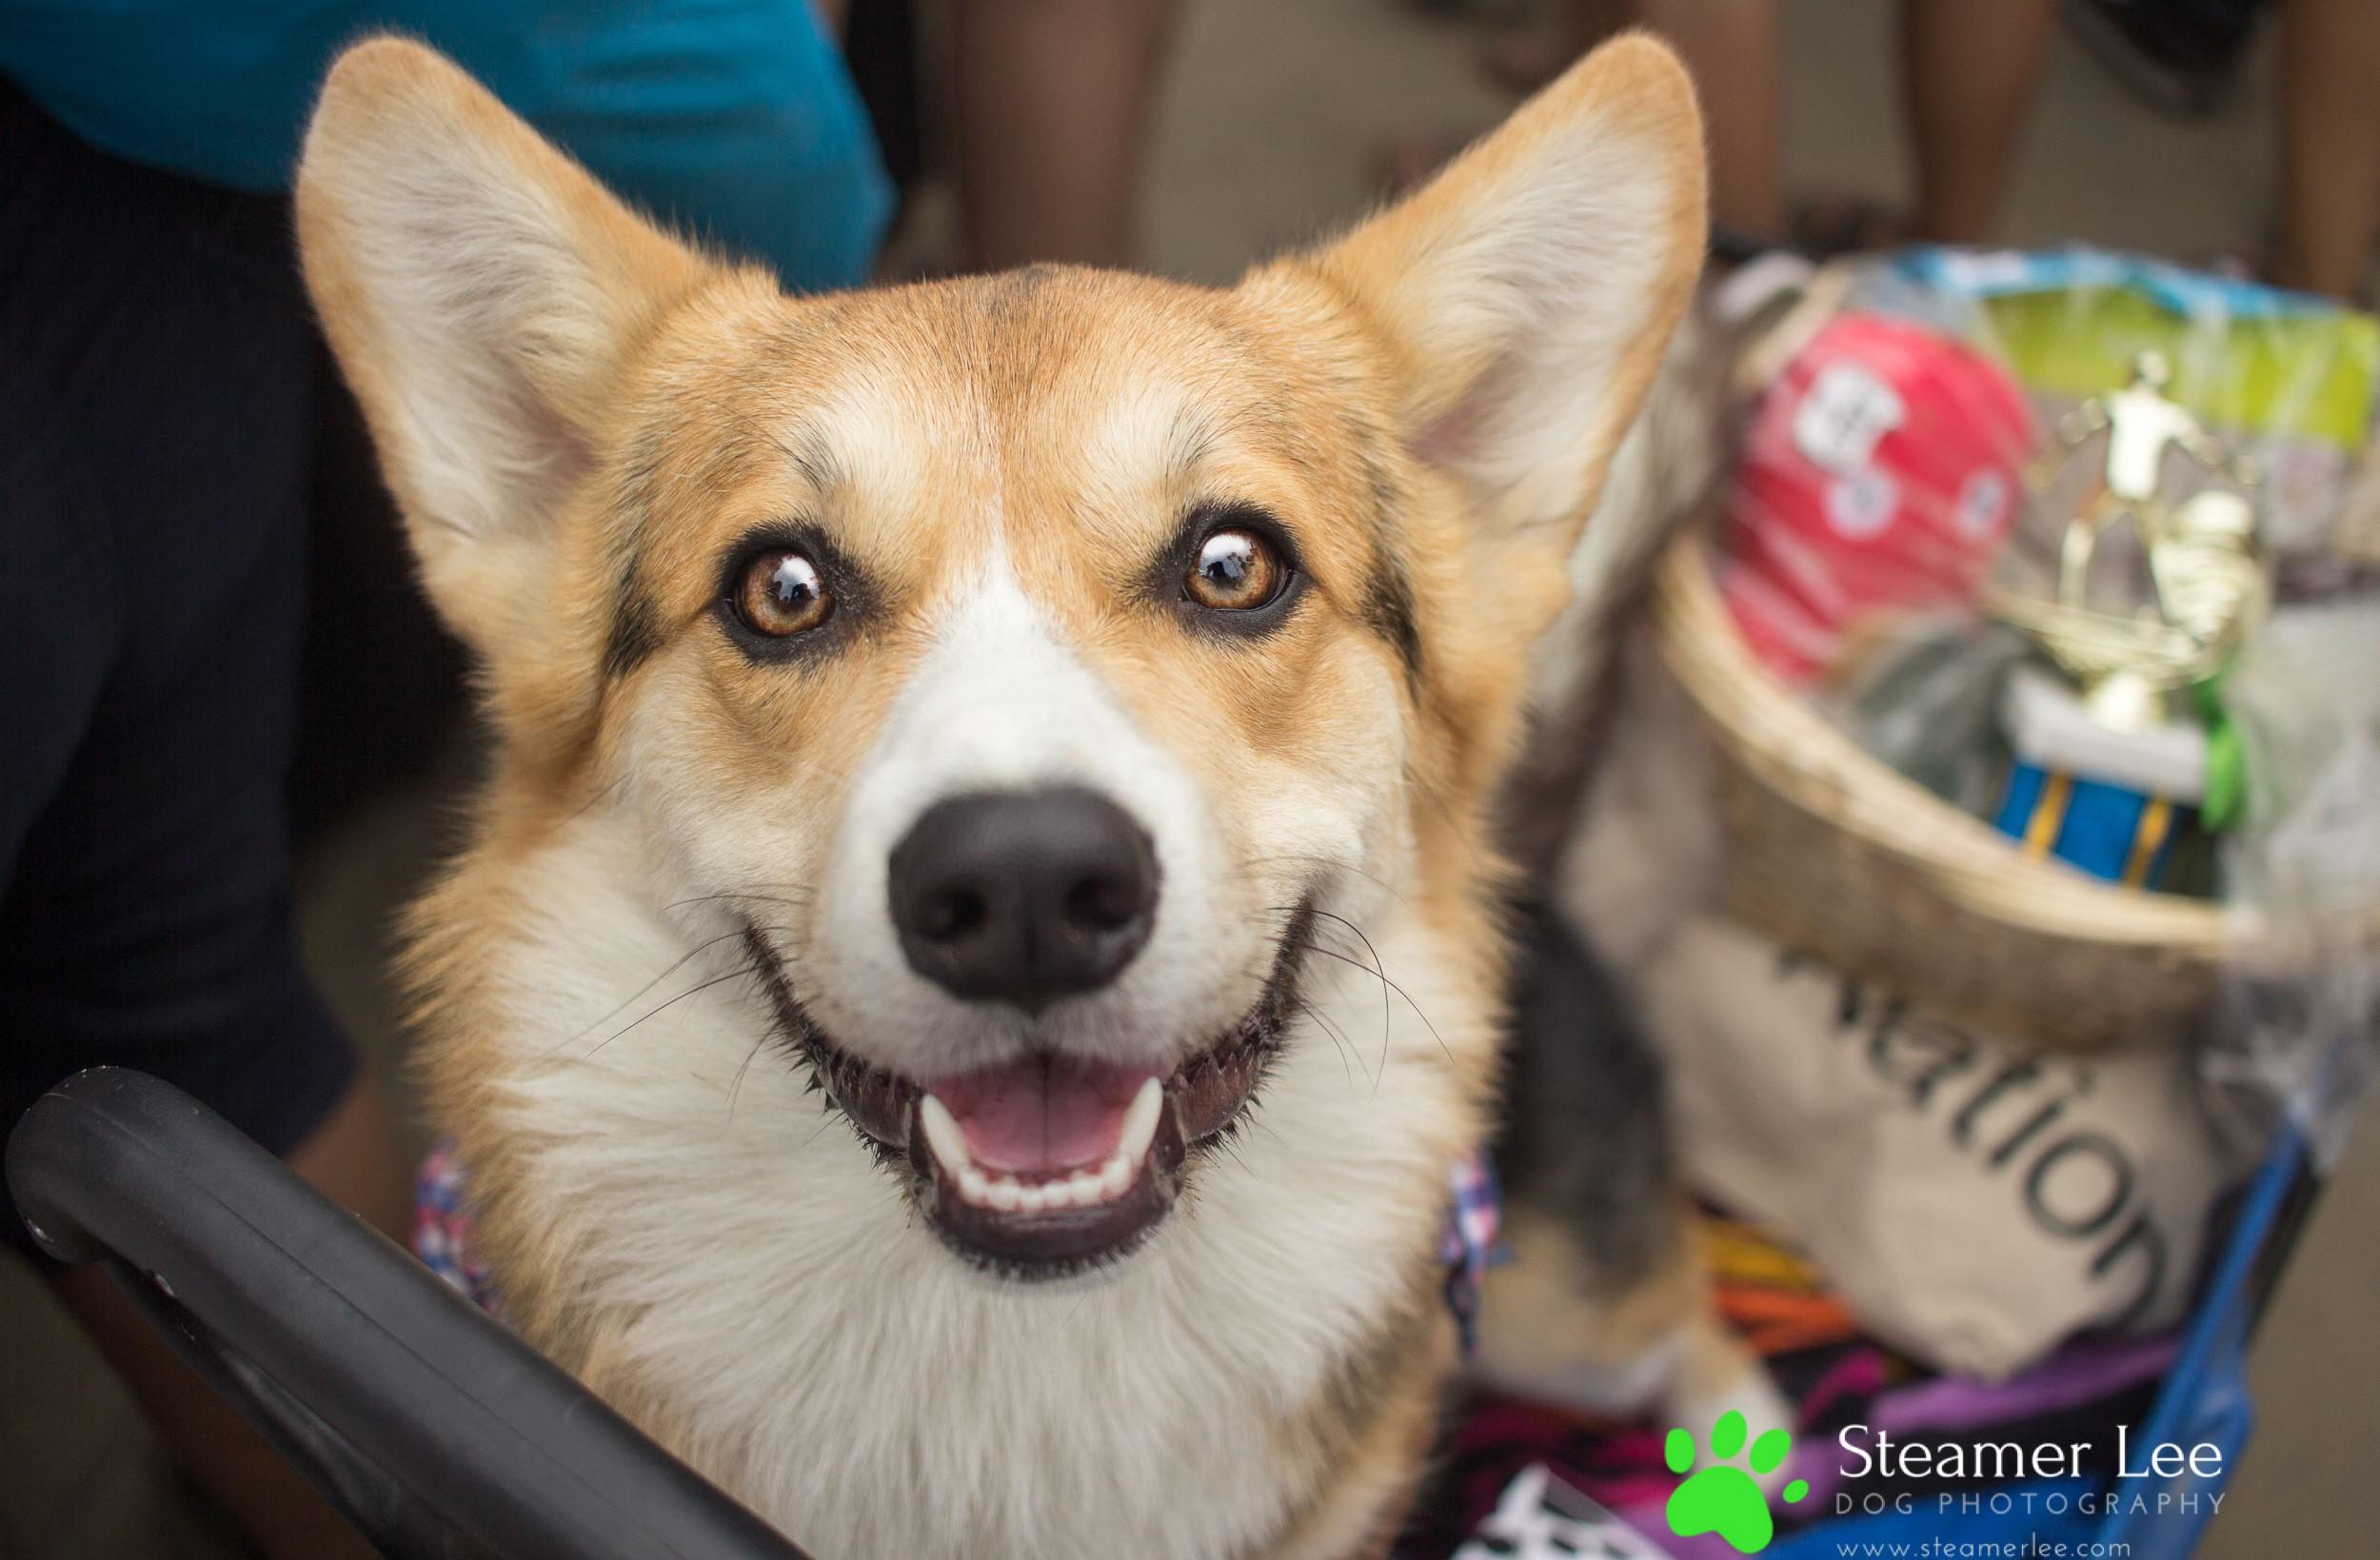 Steamer Lee Dog Photography - July 2017 So Cal Corgi Beach Day - Vol. 3 - 8.jpg